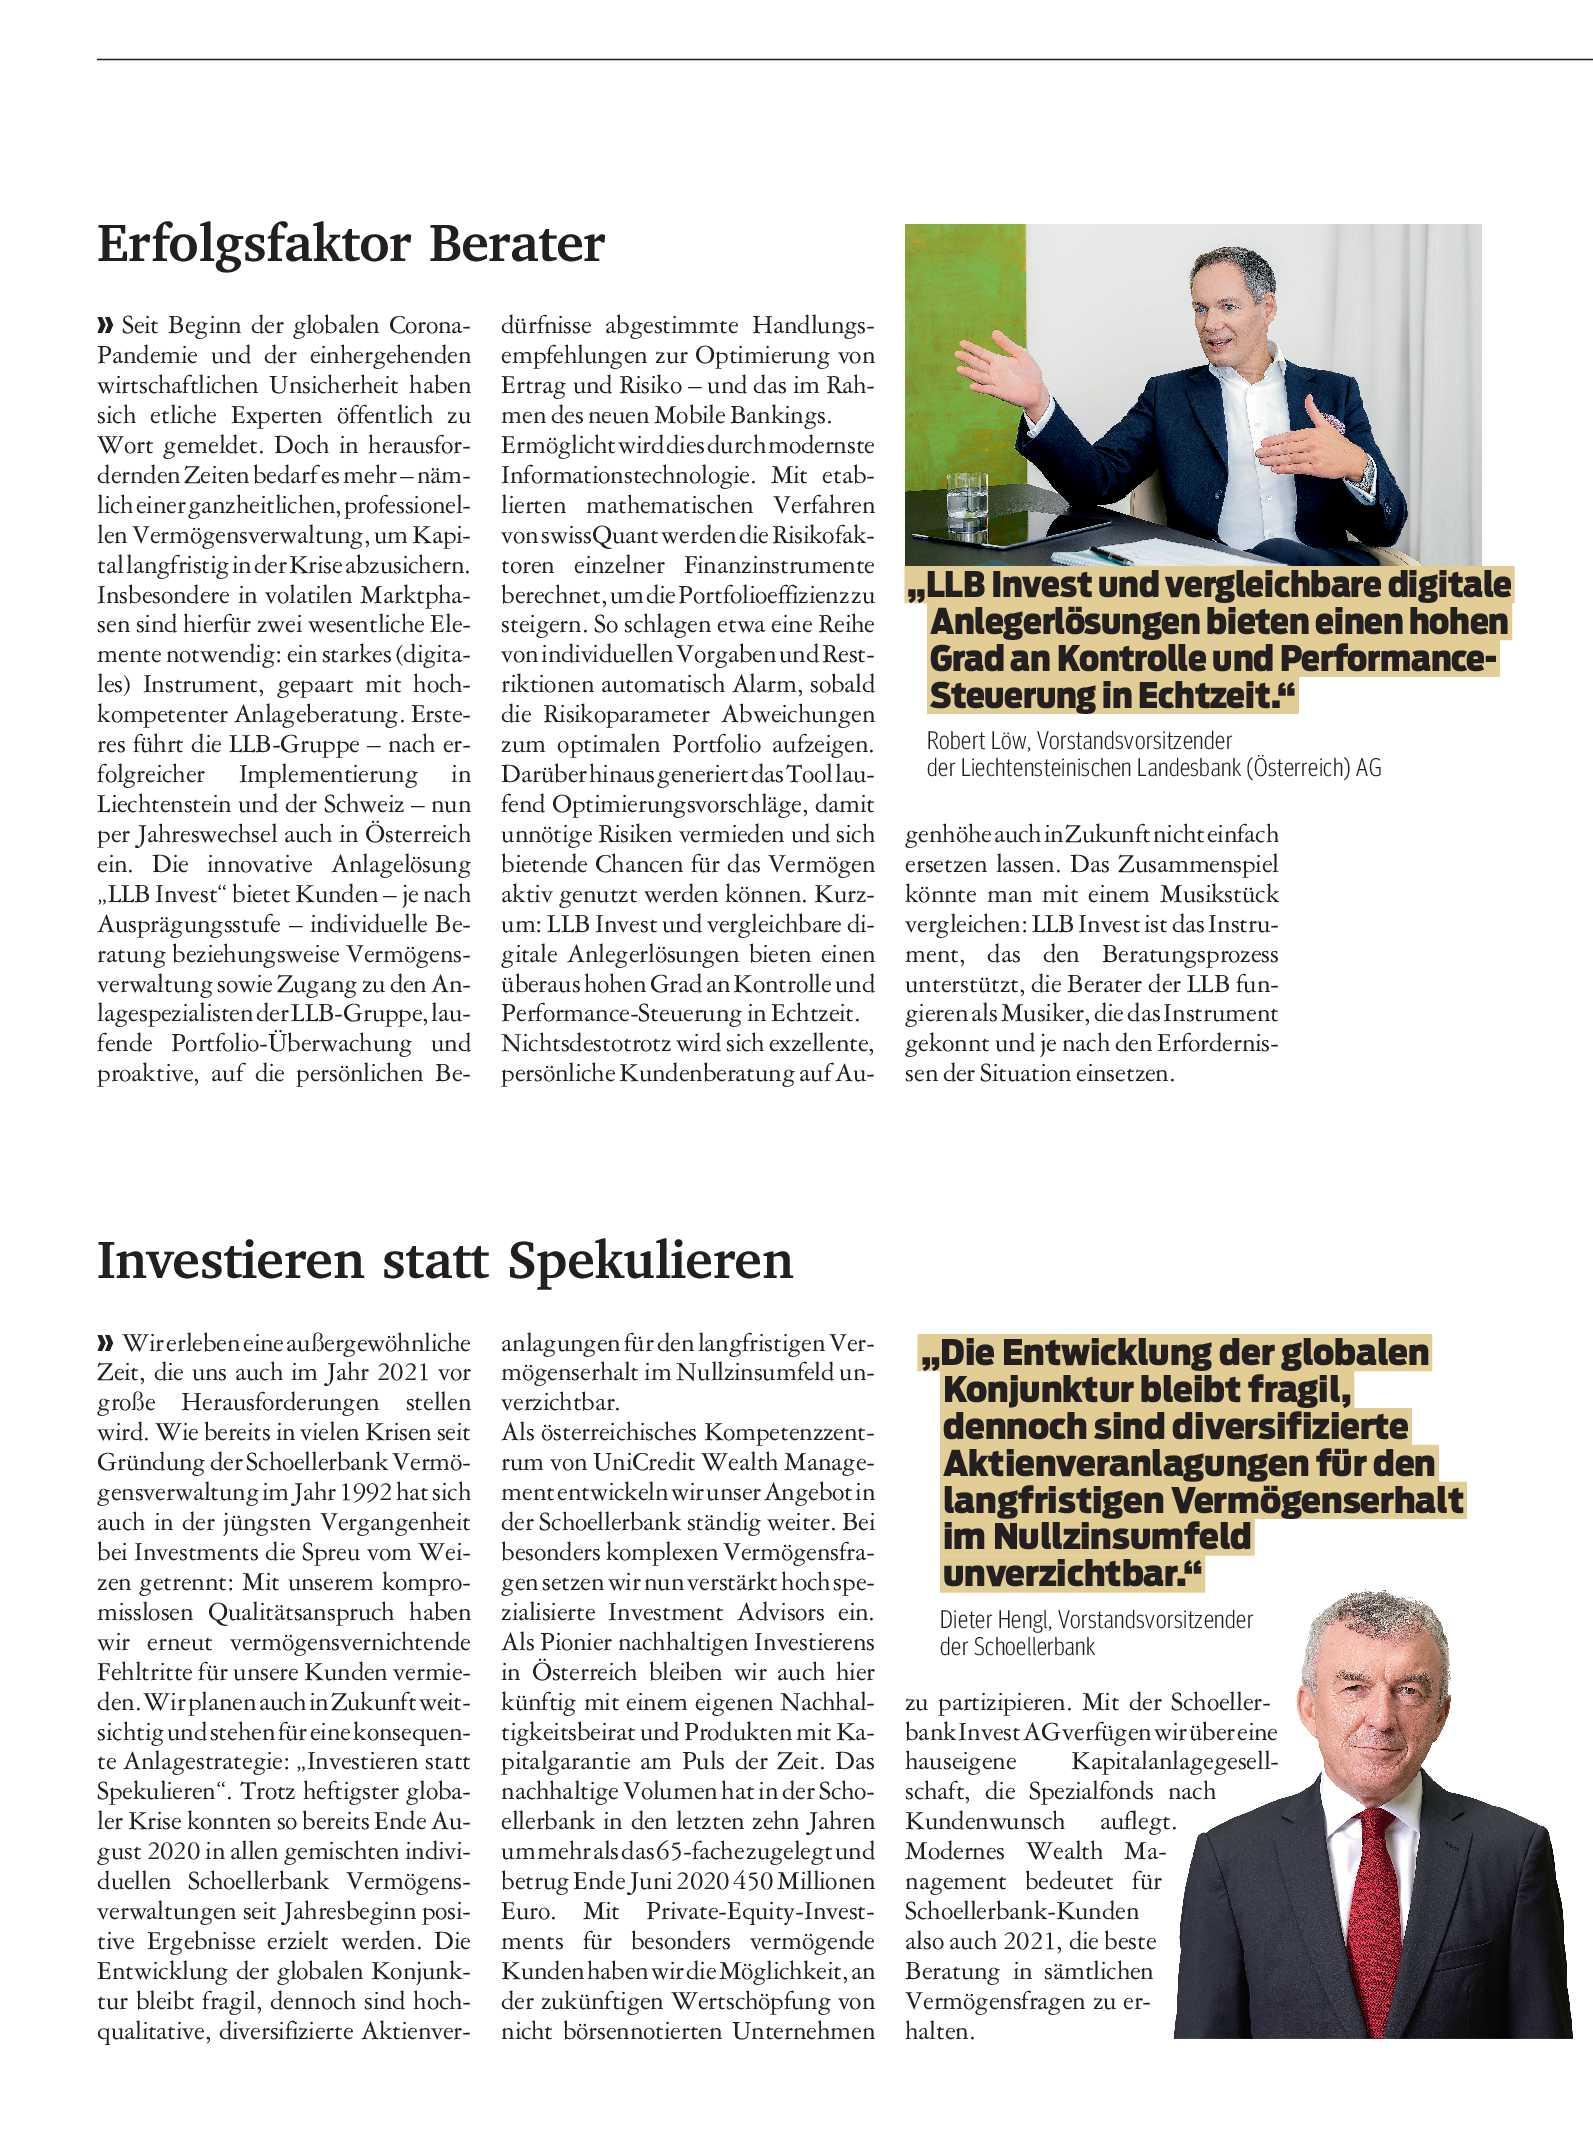 public/epaper/imported/20201118/kurier/magazin/magazin_20201118_020.jpg